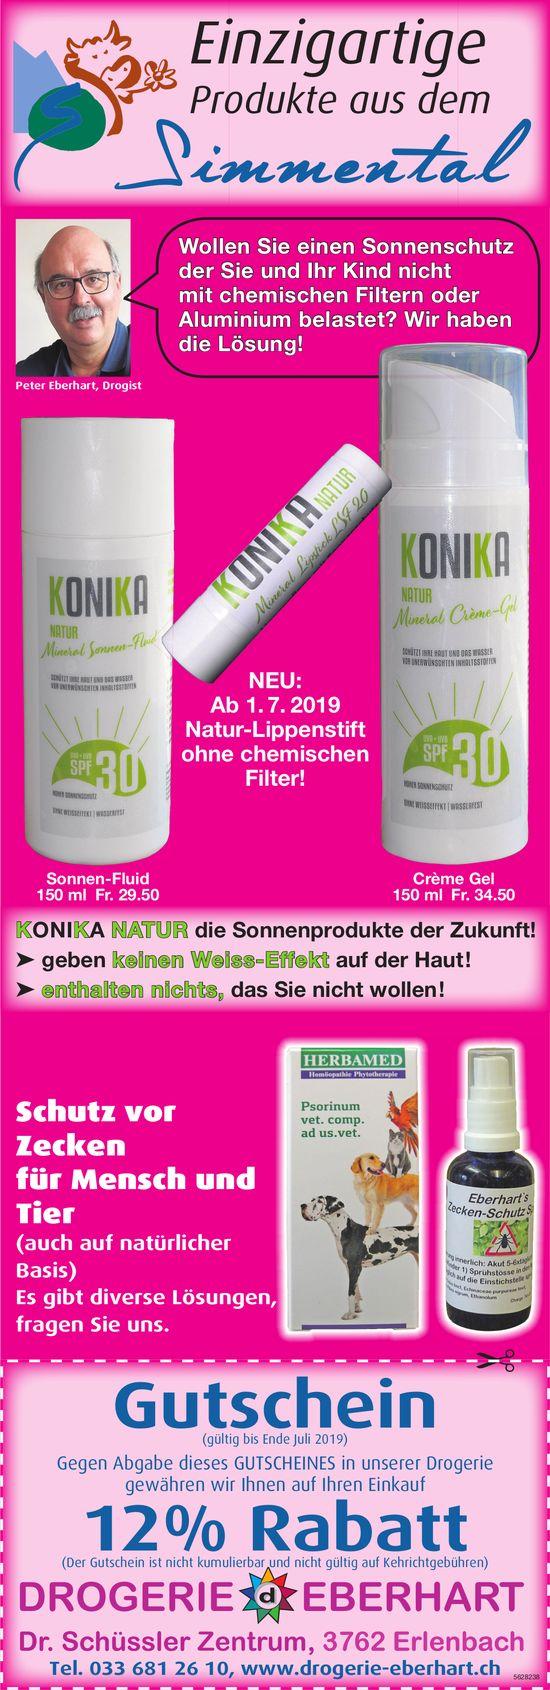 DROGERIE EBERHART, Dr. Schüssler Zentrum, Erlenbach - Gutschein, 12% Rabatt